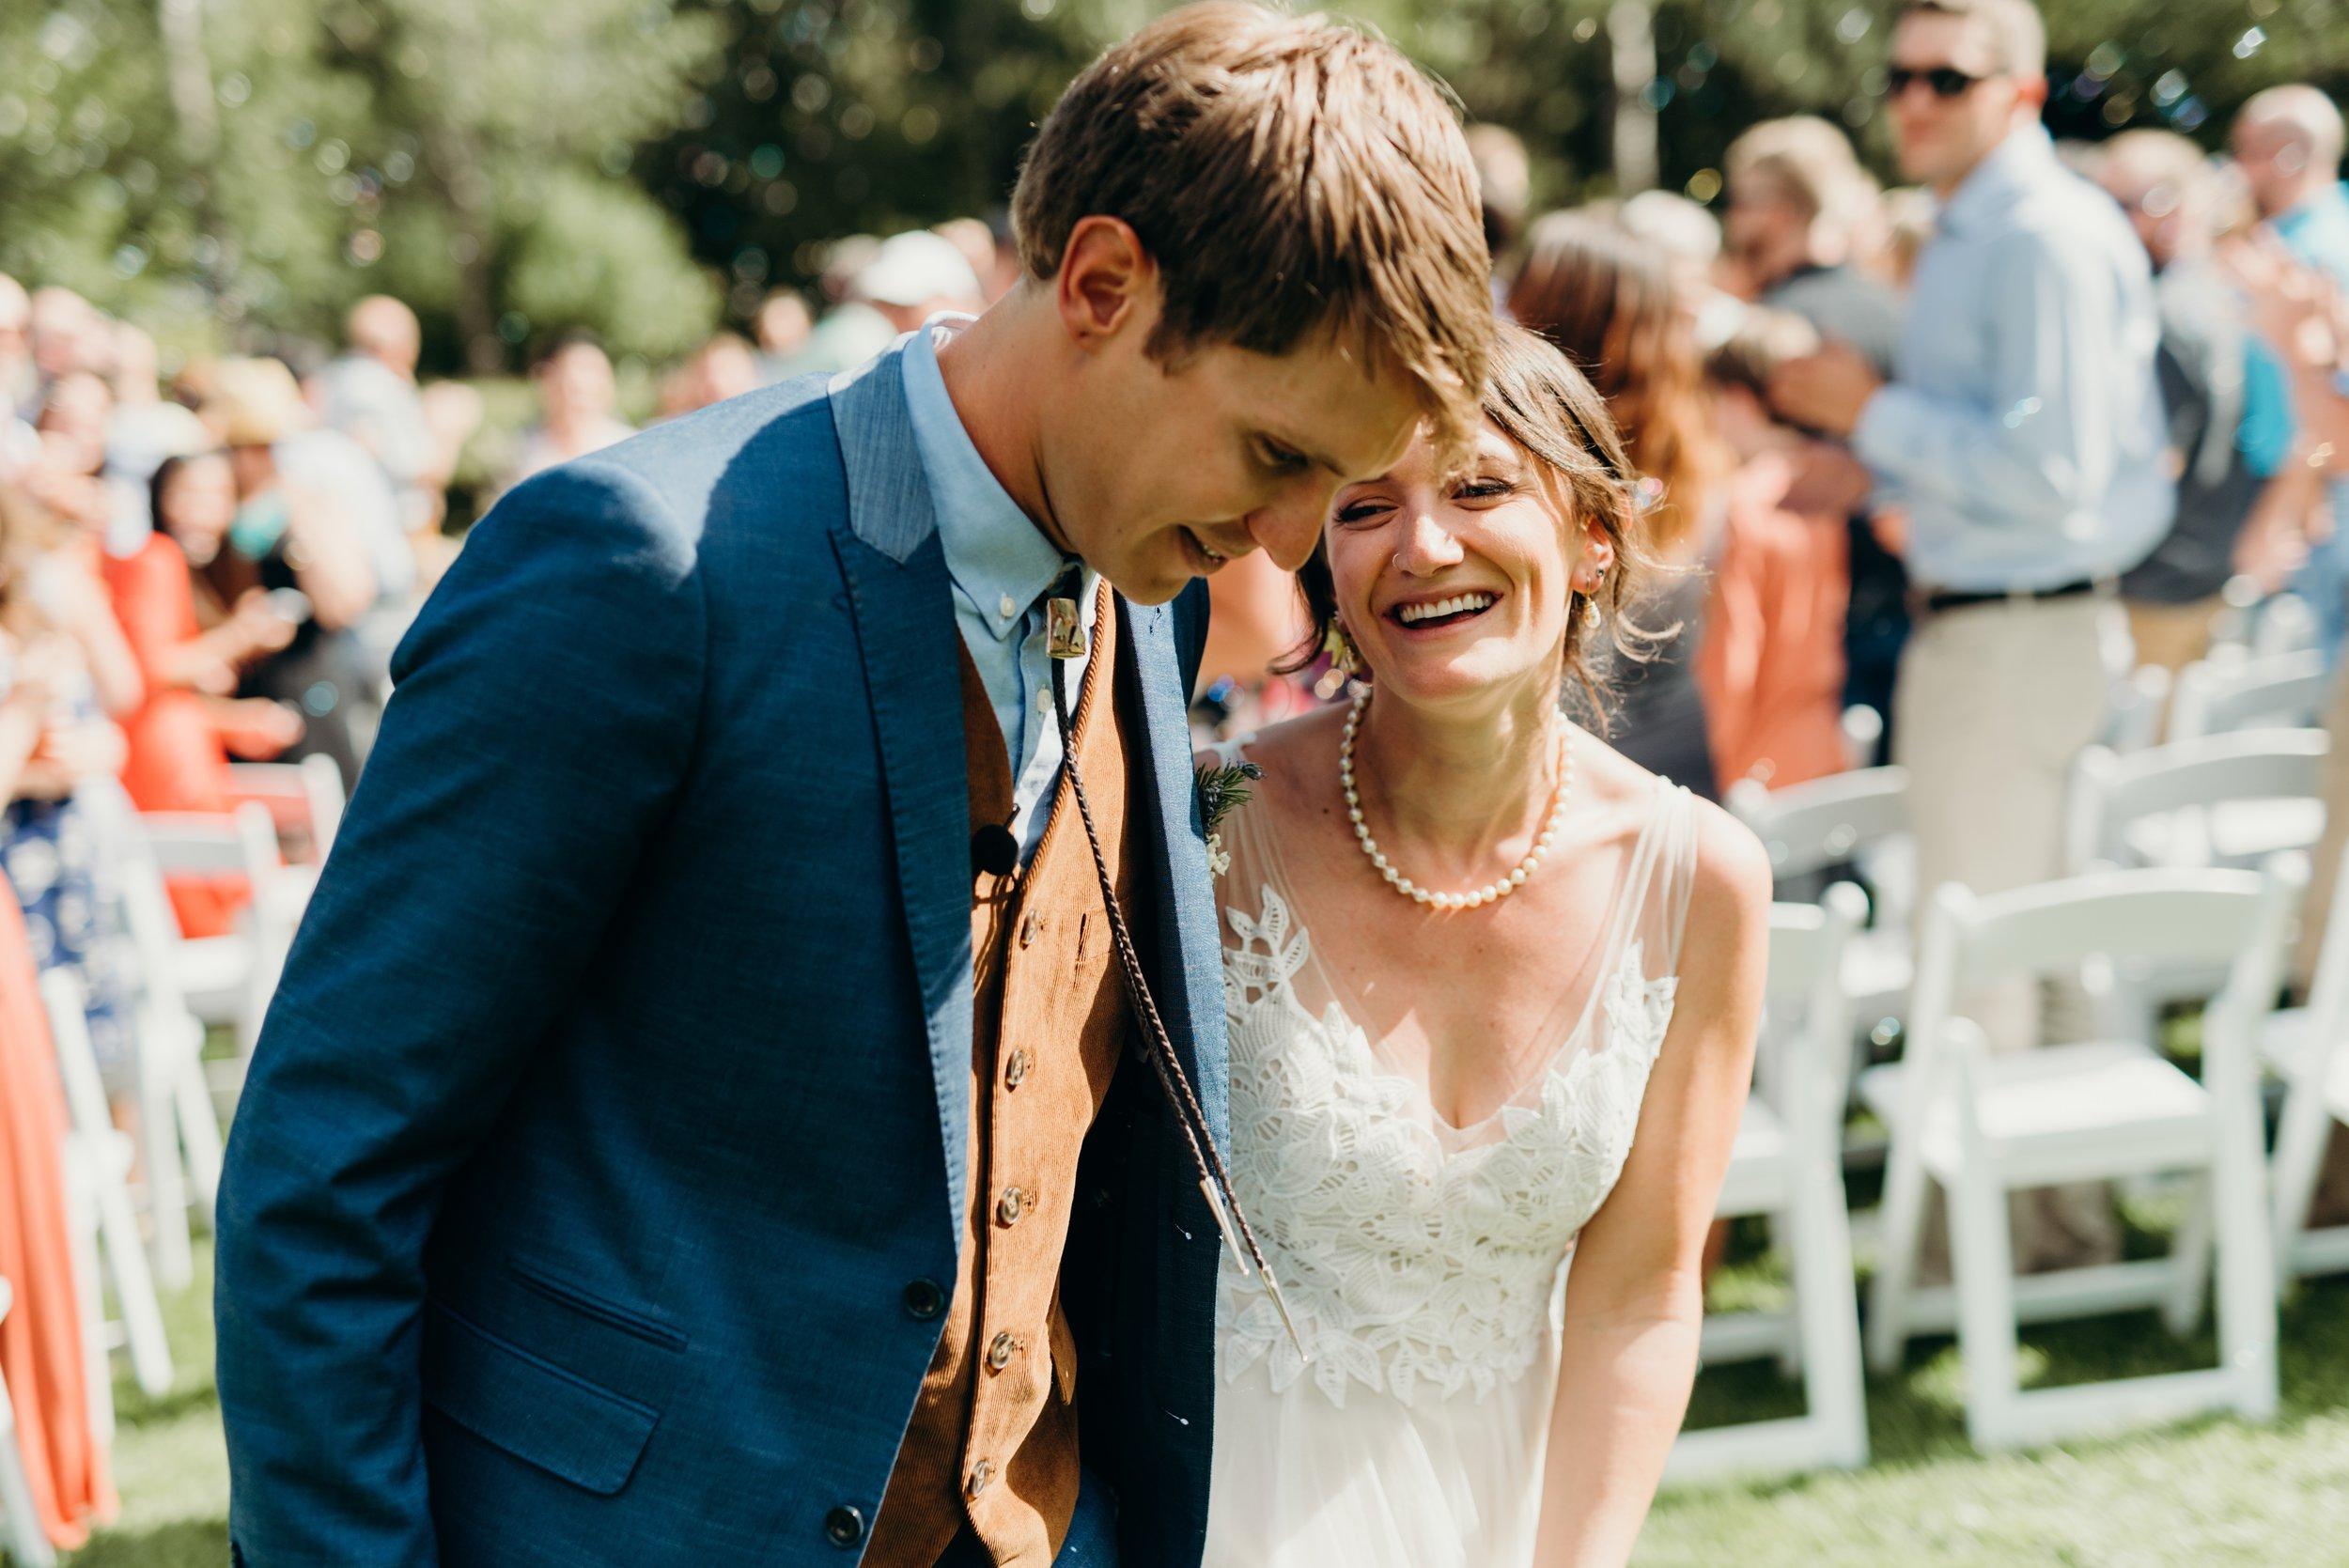 Sarah & Ben's Steamboat Springs, Colorado Bicycle Wedding